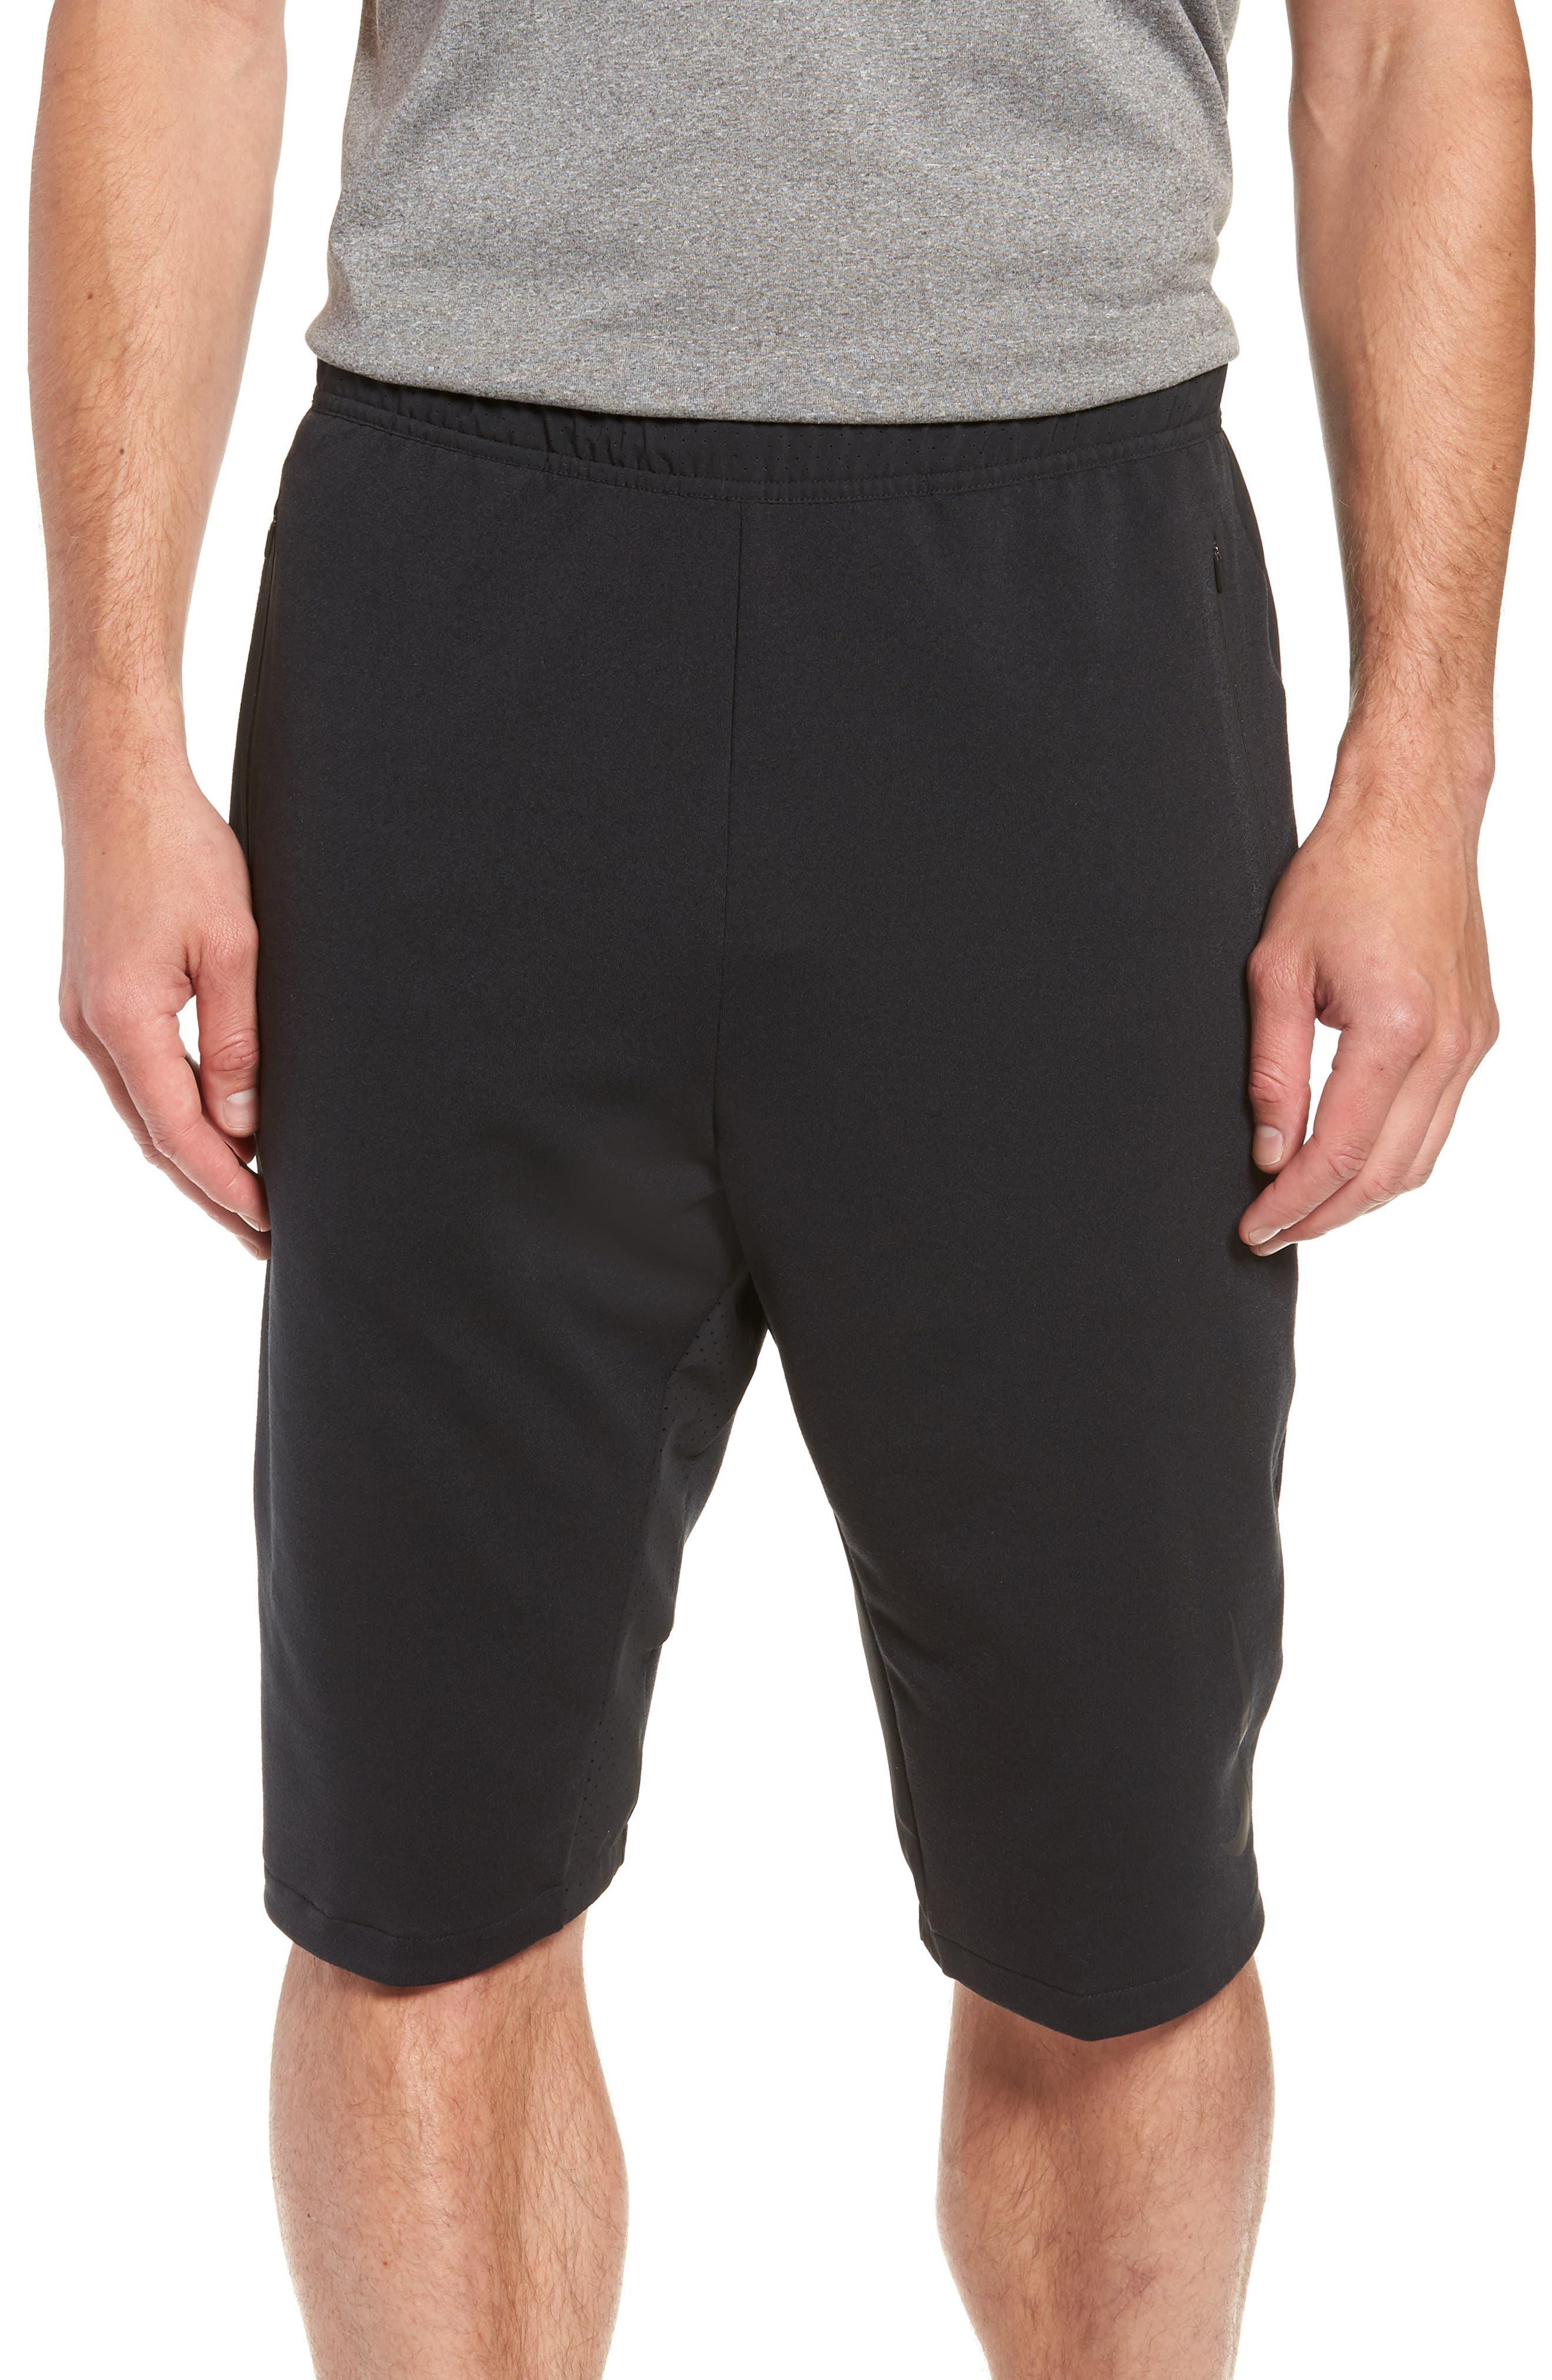 Dry Max Training Shorts,                         Main,                         color, 010